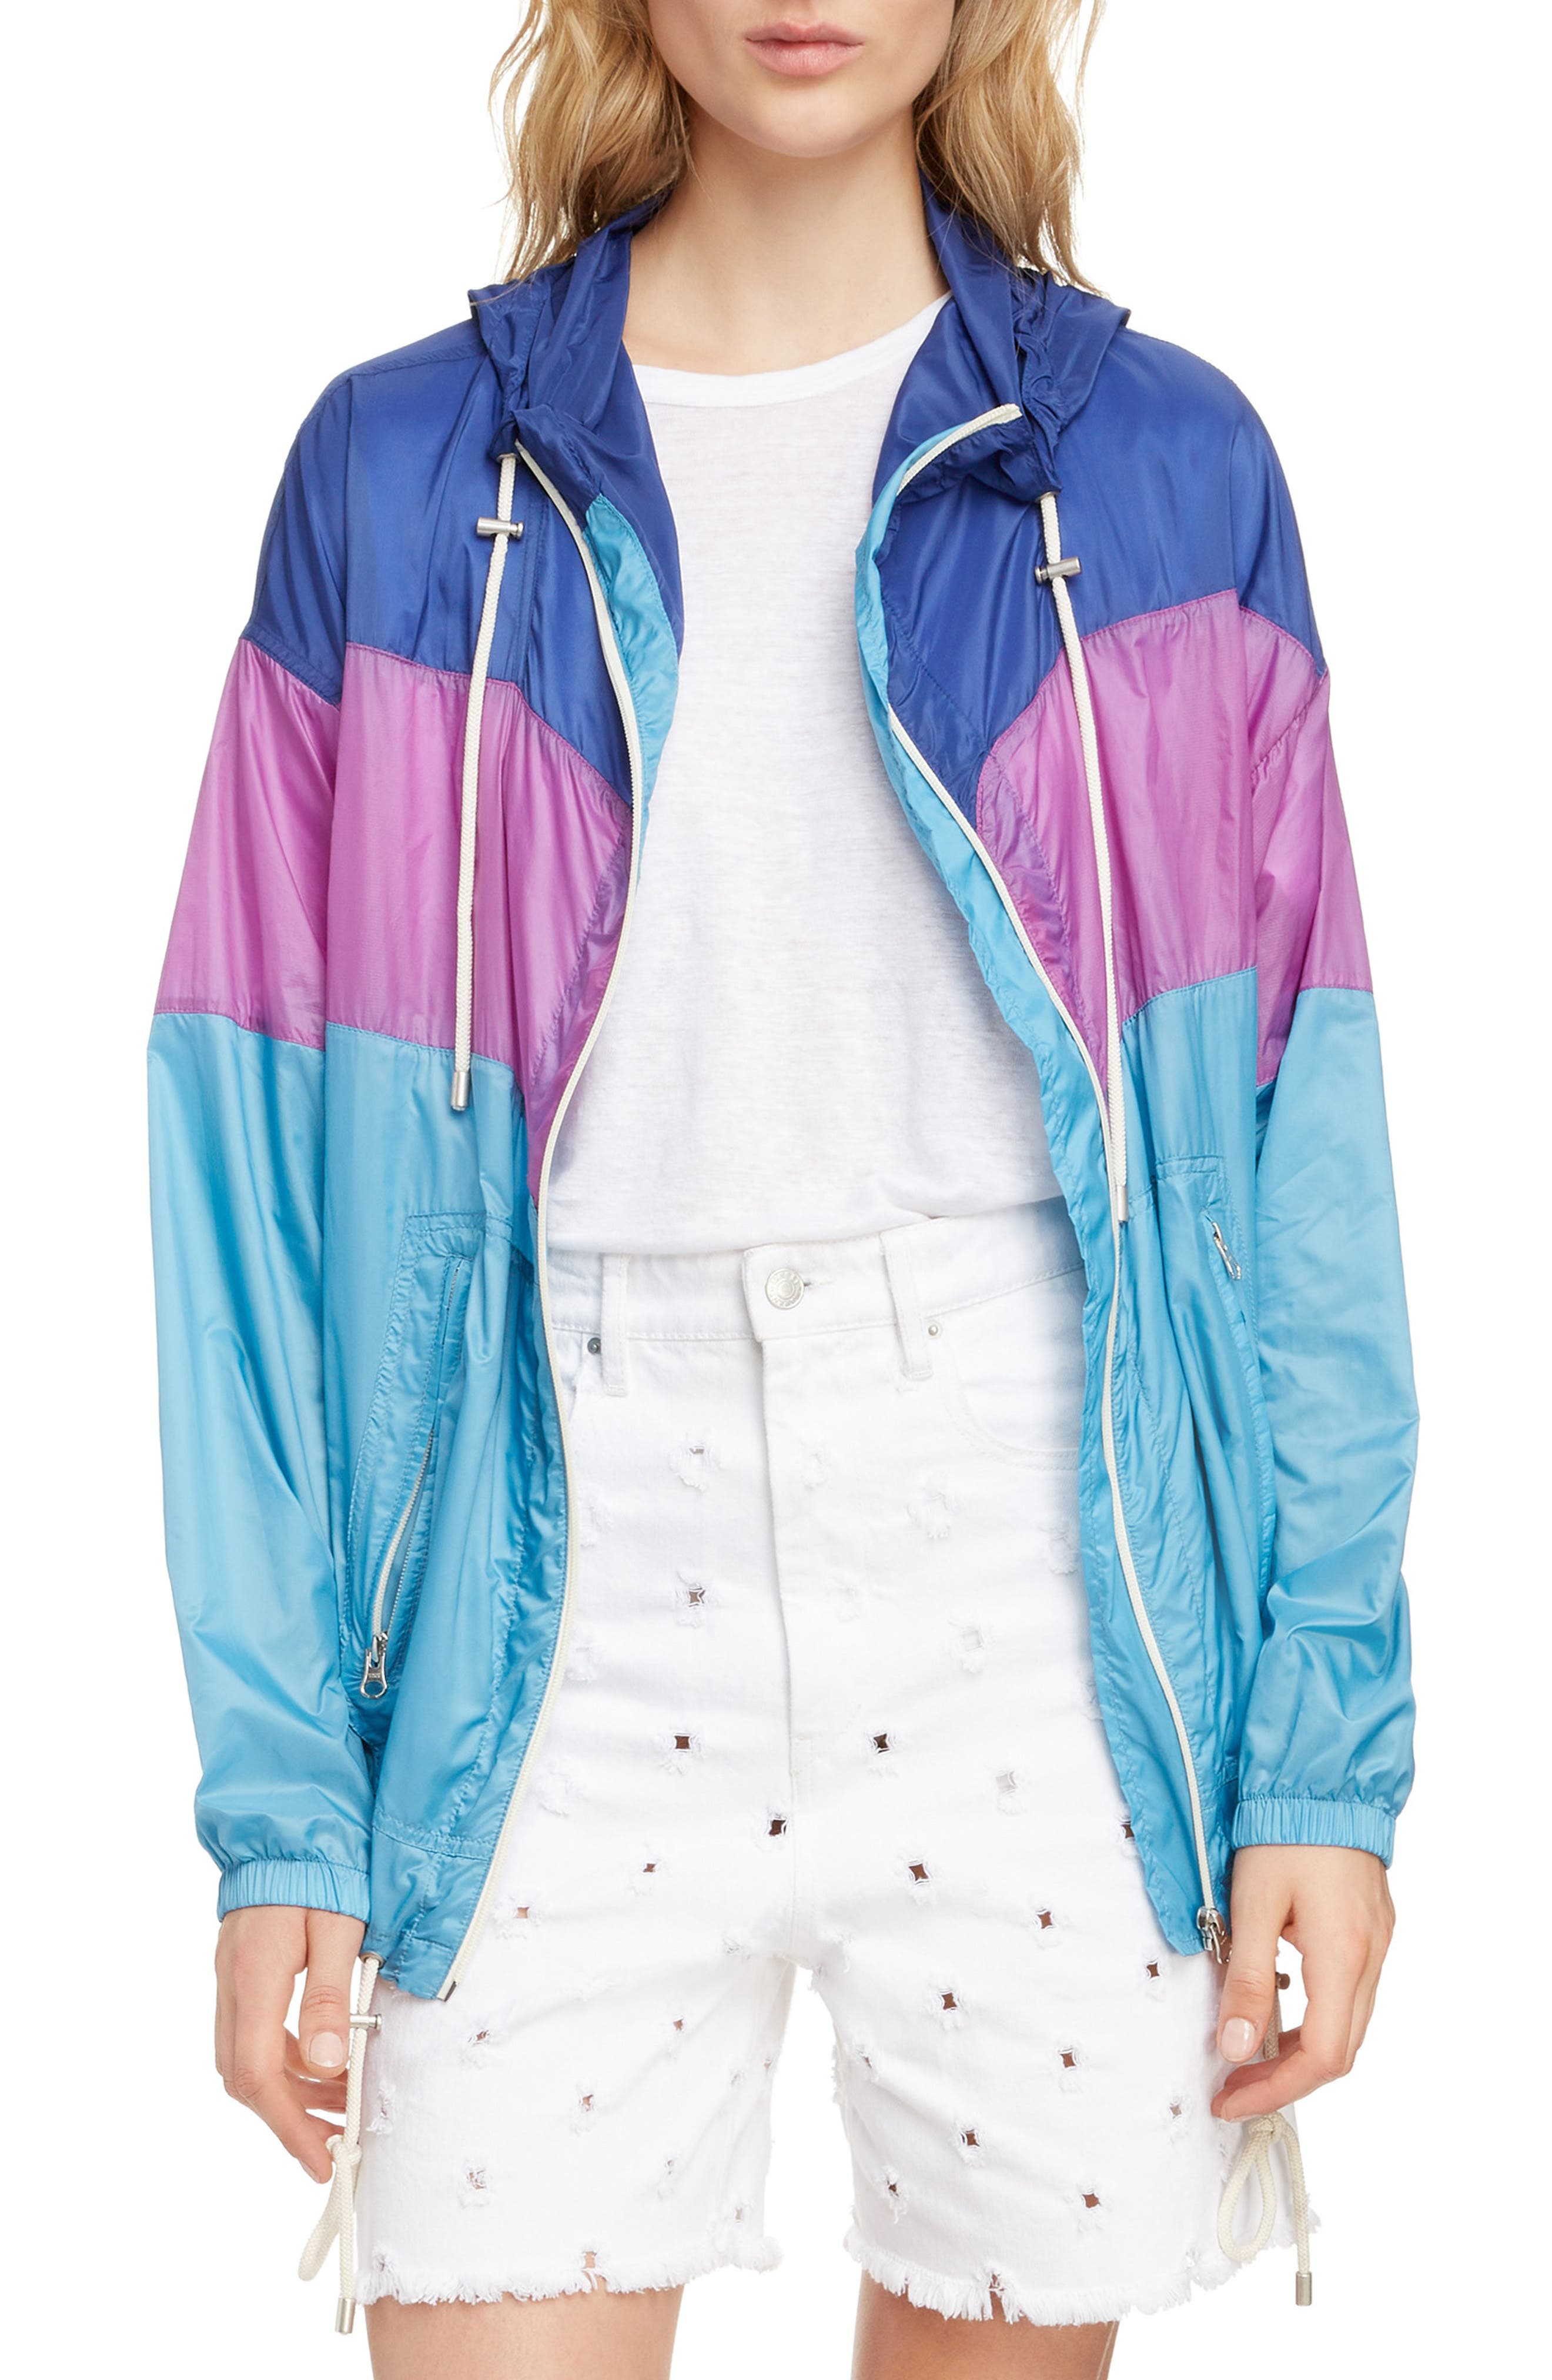 ISABEL MARANT ÉTOILE, Kyriel Colorblock Hooded Jacket, Main thumbnail 1, color, ELECTRIC BLUE/ VIOLET